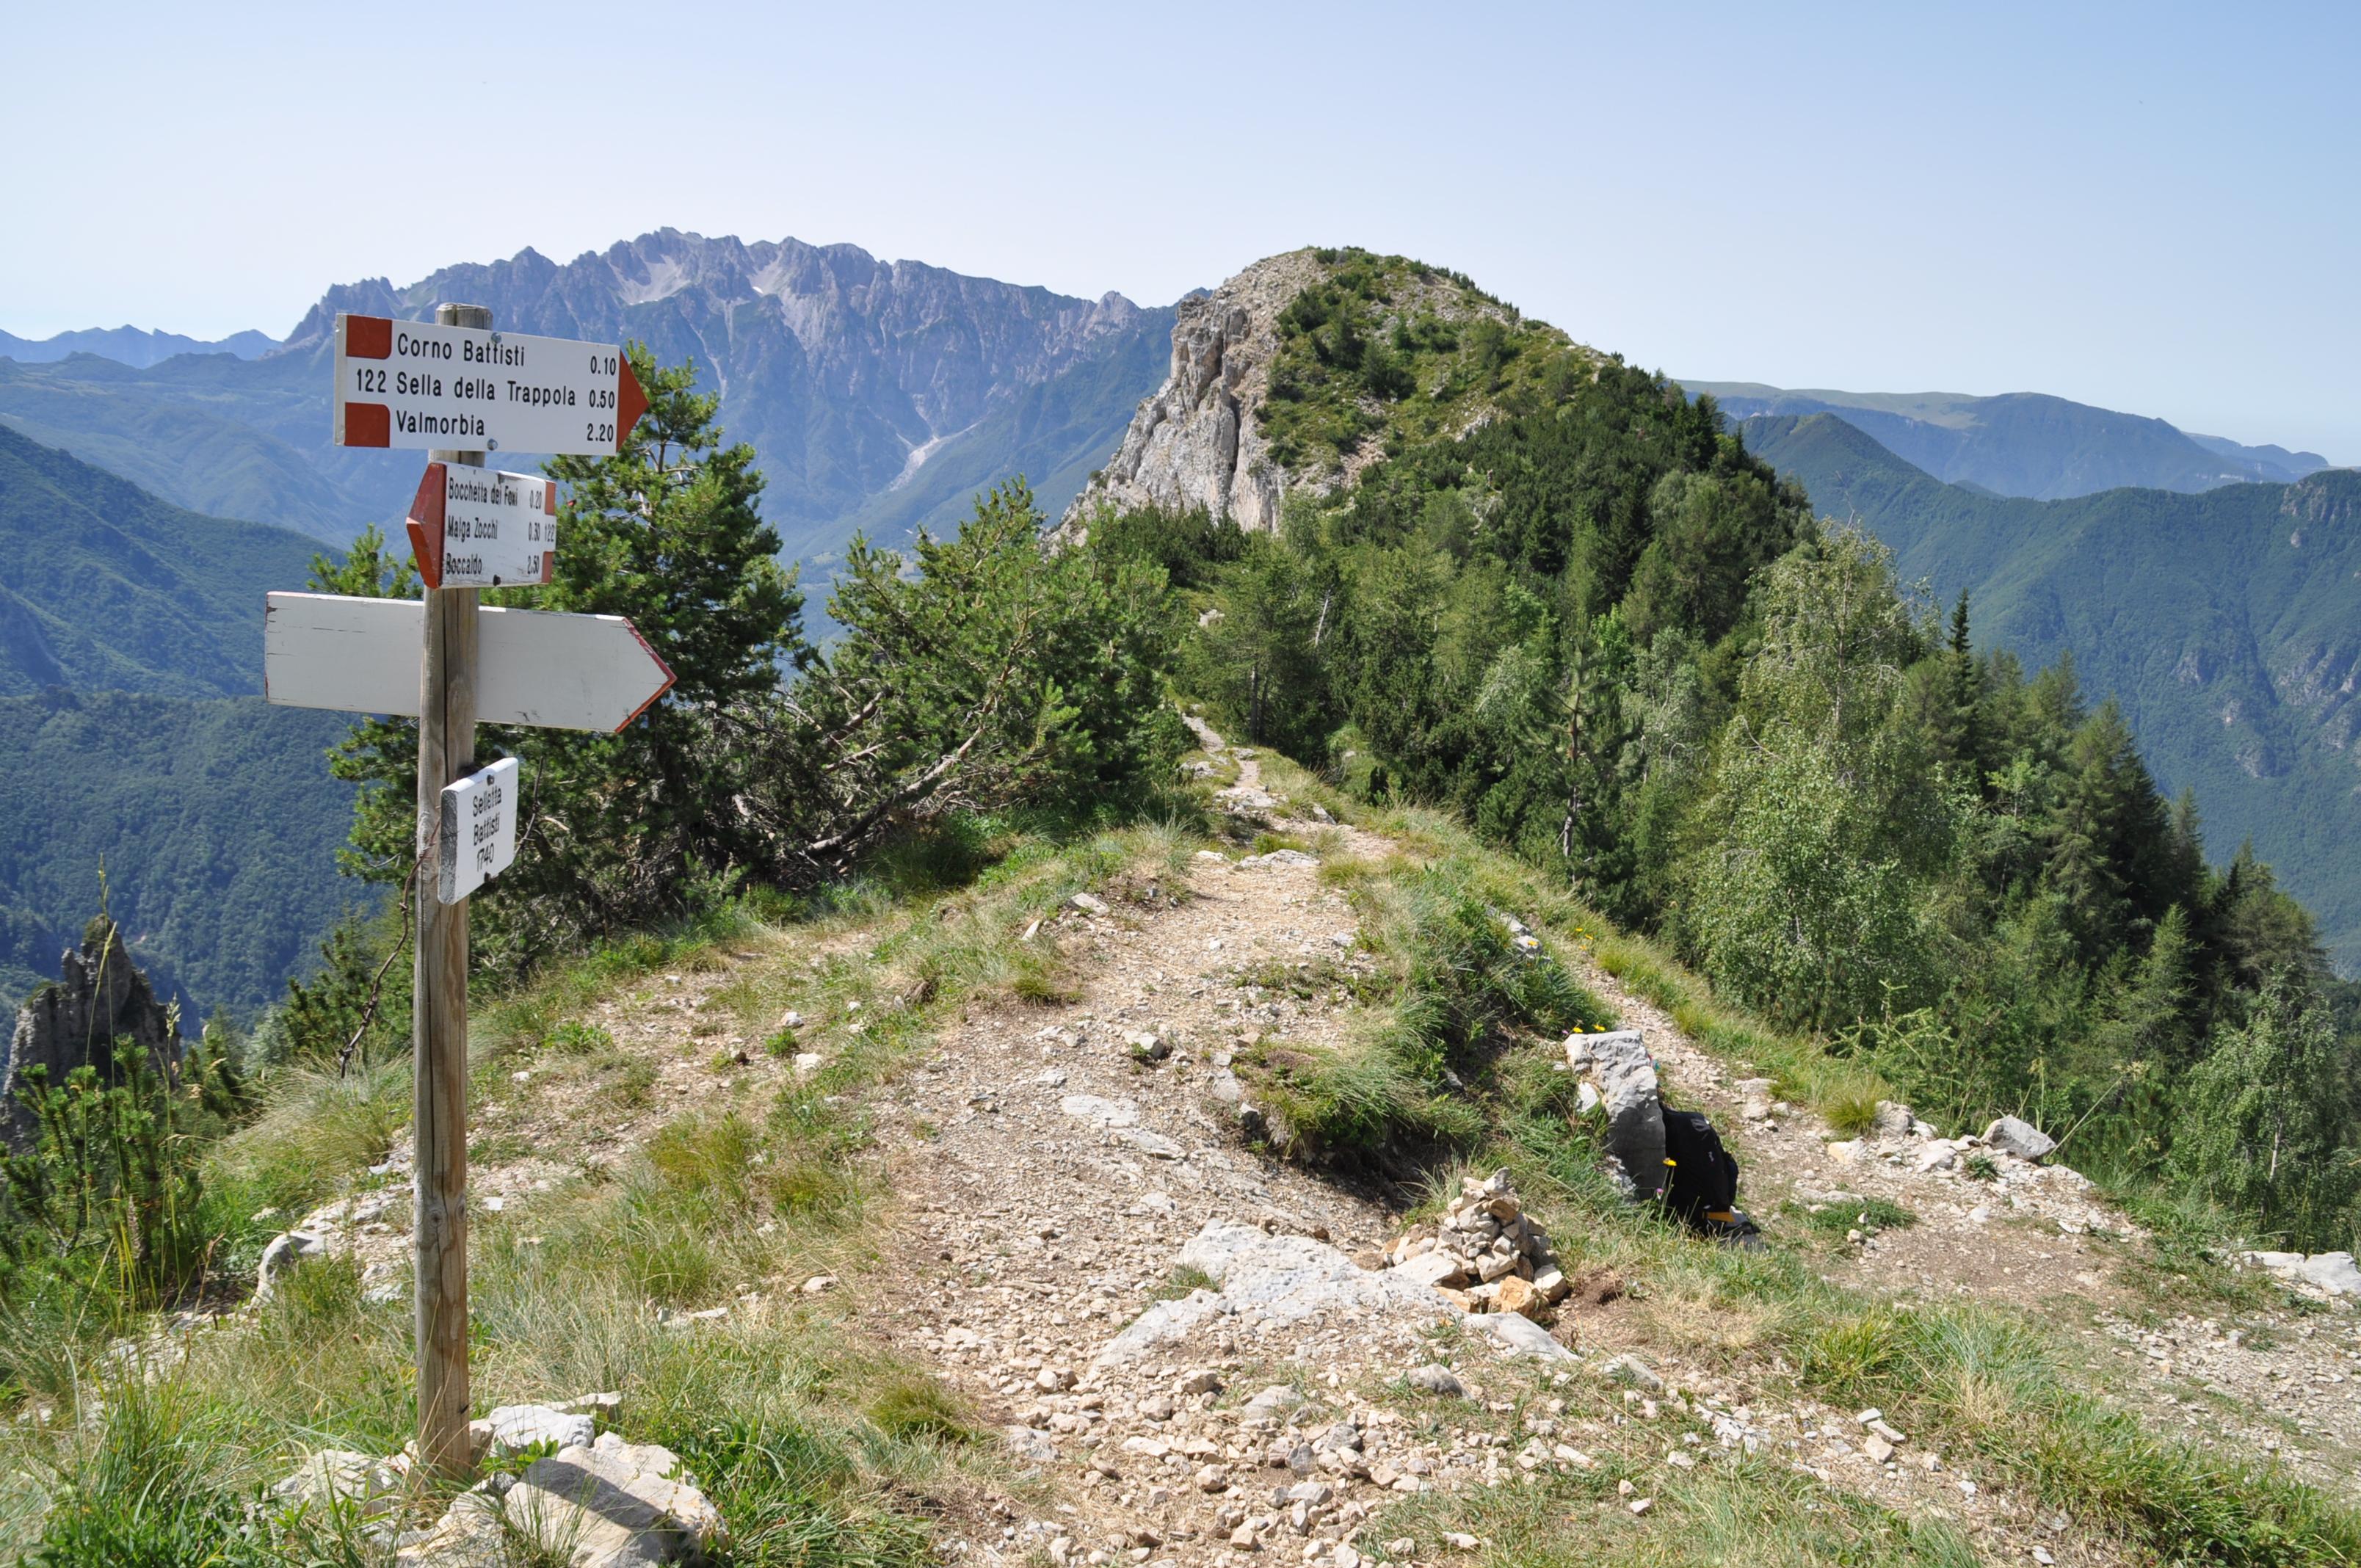 Albe in Malga sul Monte Pasubio